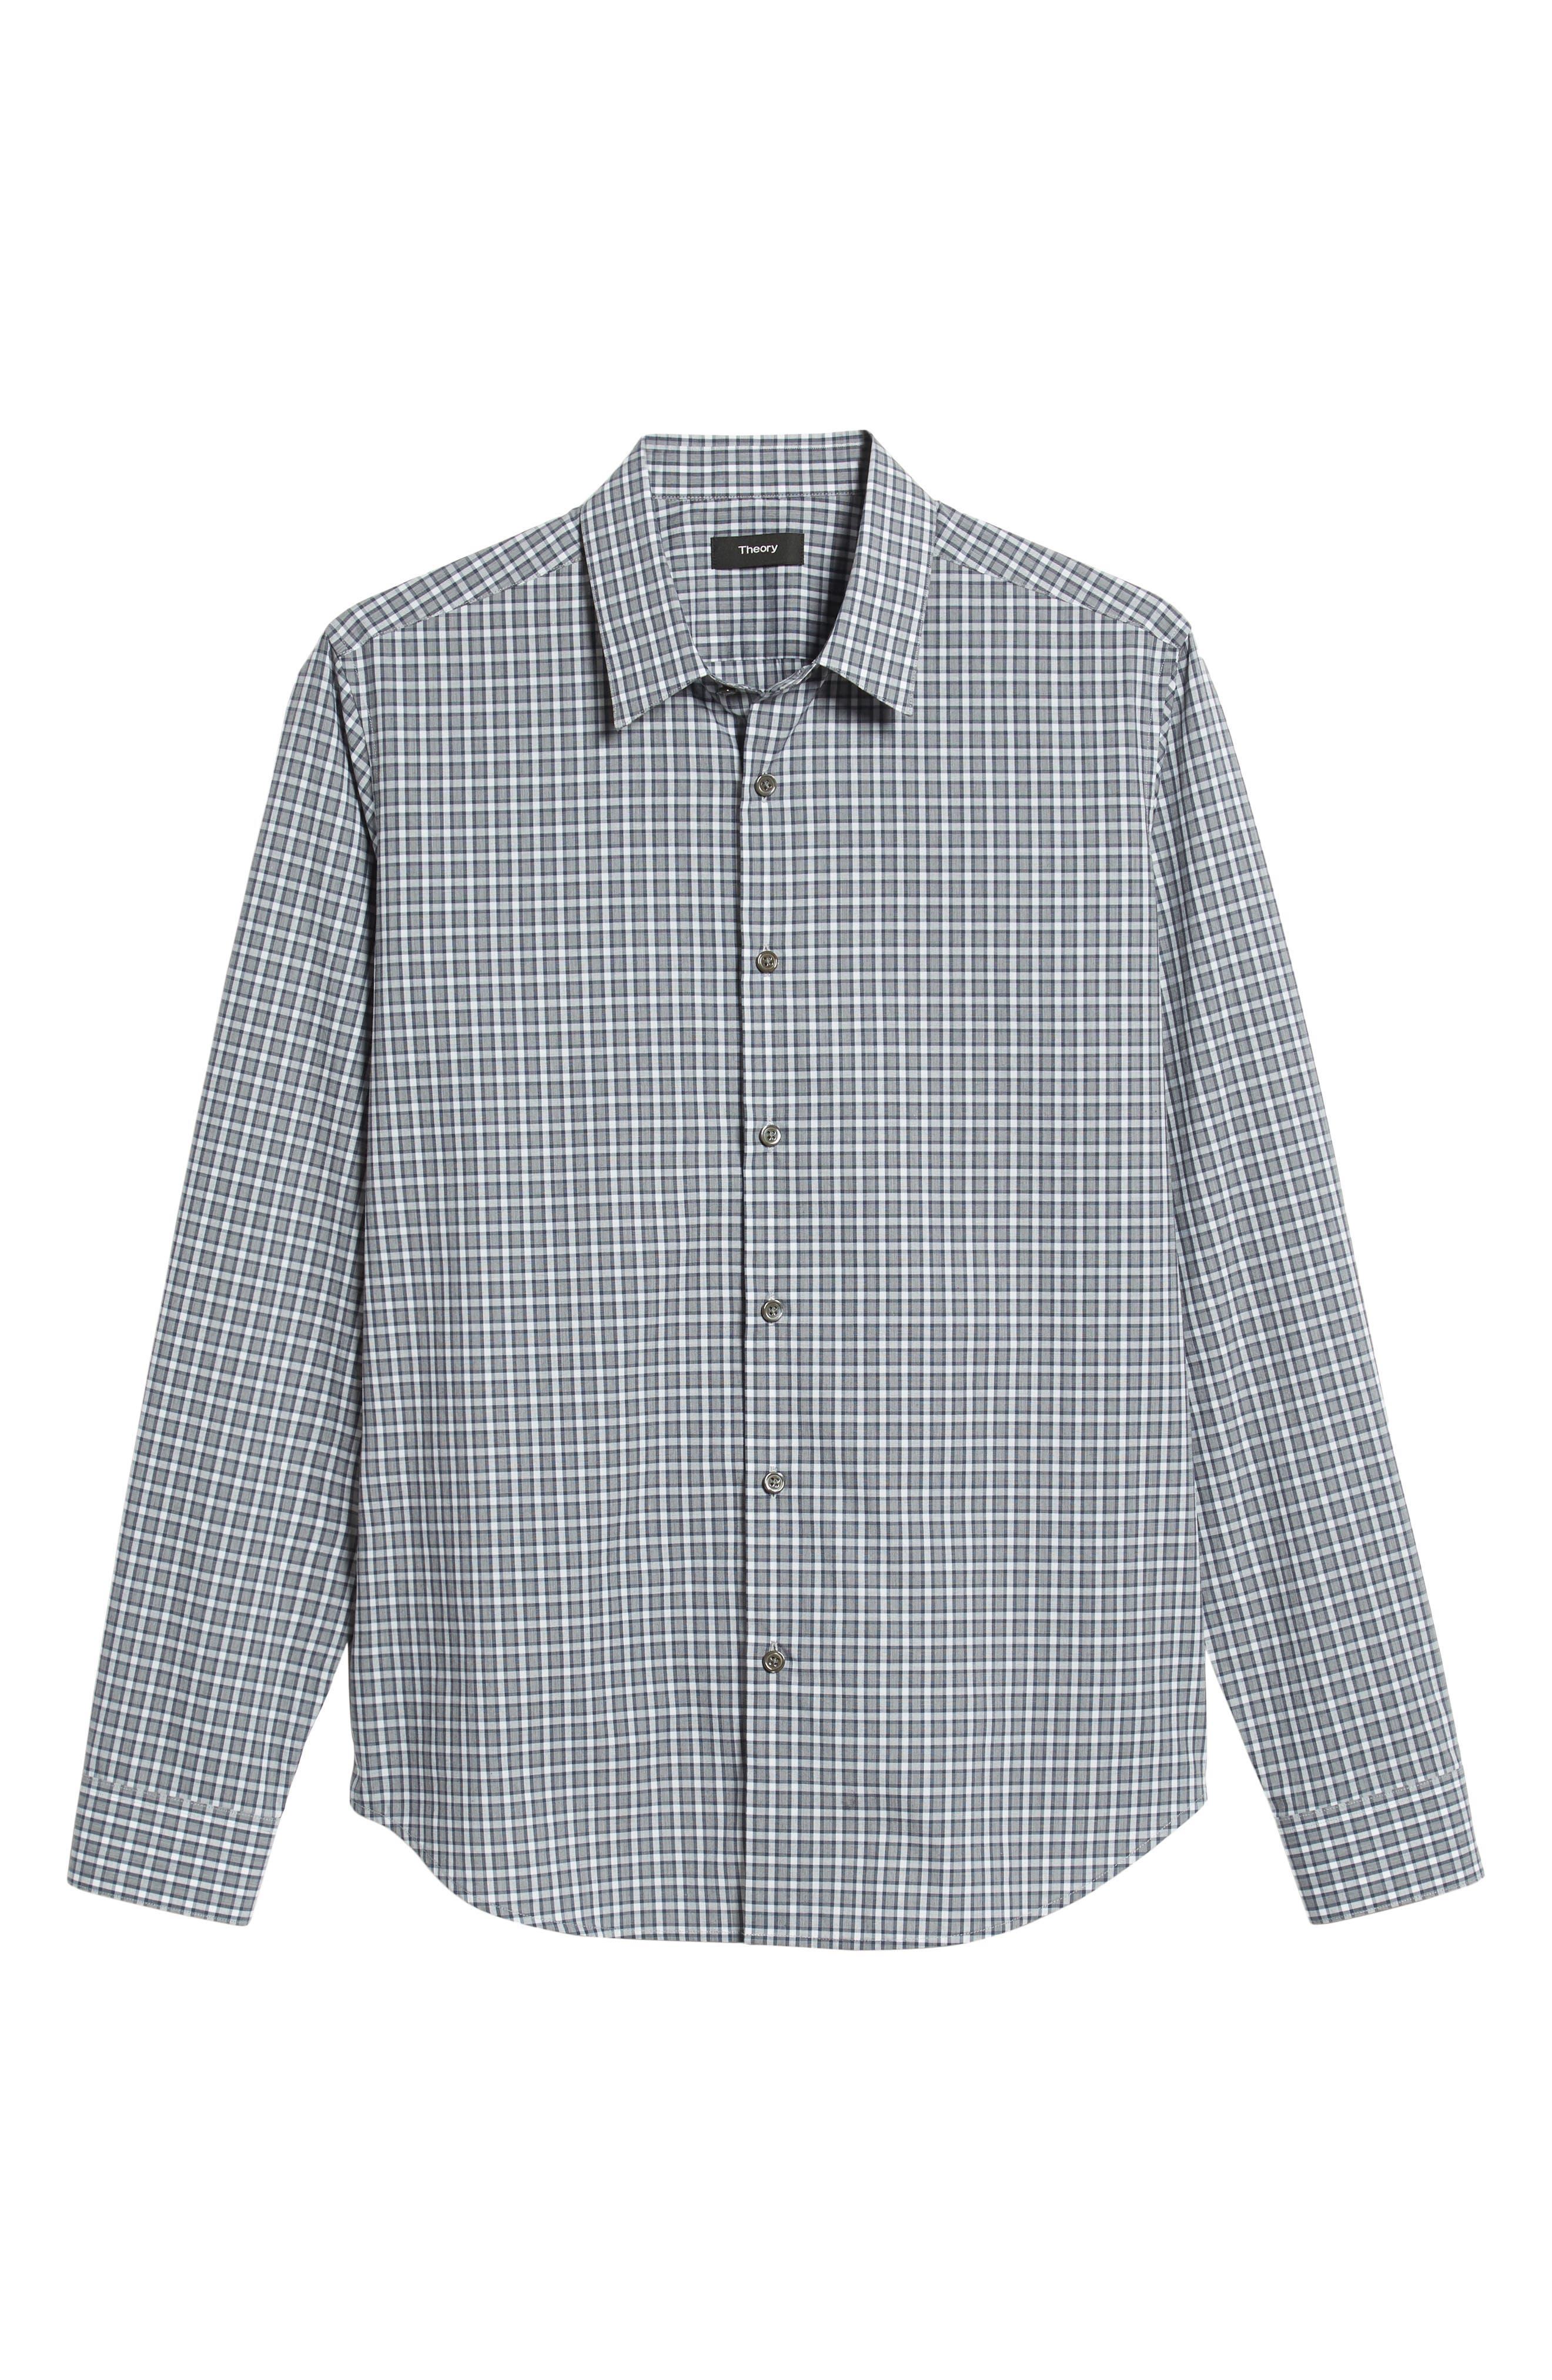 Sylvain Regular Fit Check Sport Shirt,                             Alternate thumbnail 5, color,                             NAVY MULTI